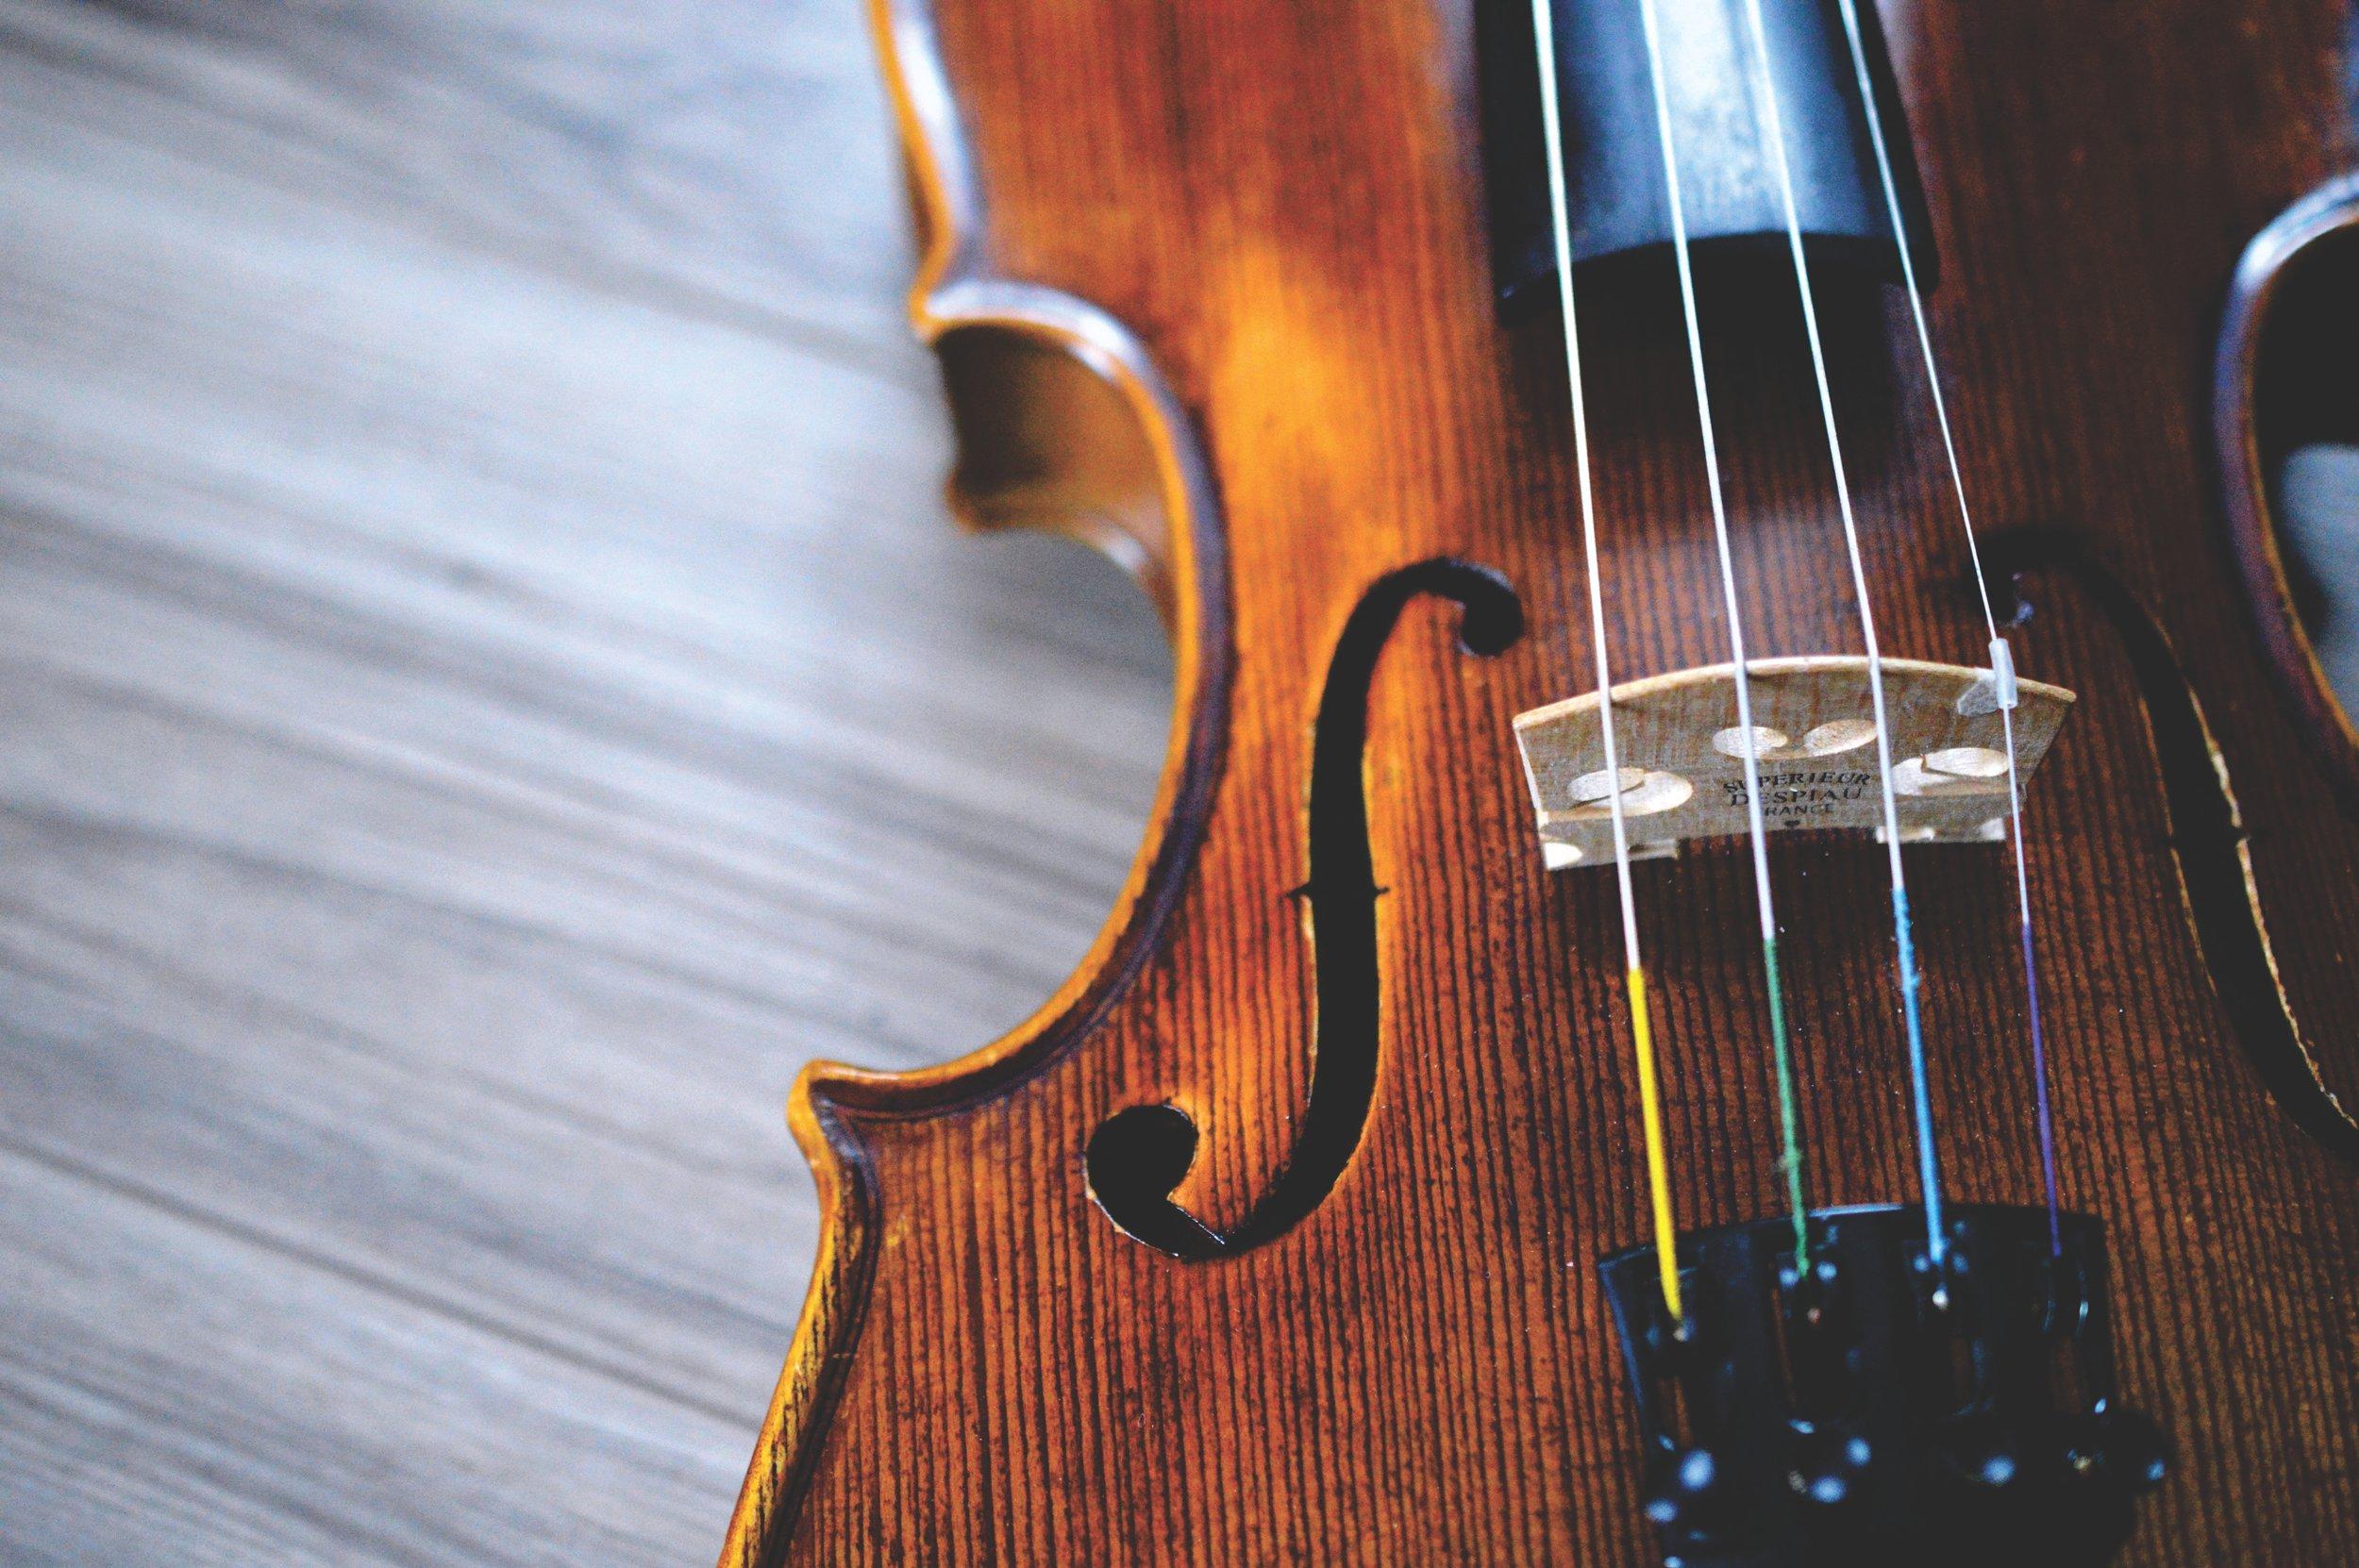 violin 2 providence-doucet-81314-unsplash.jpg